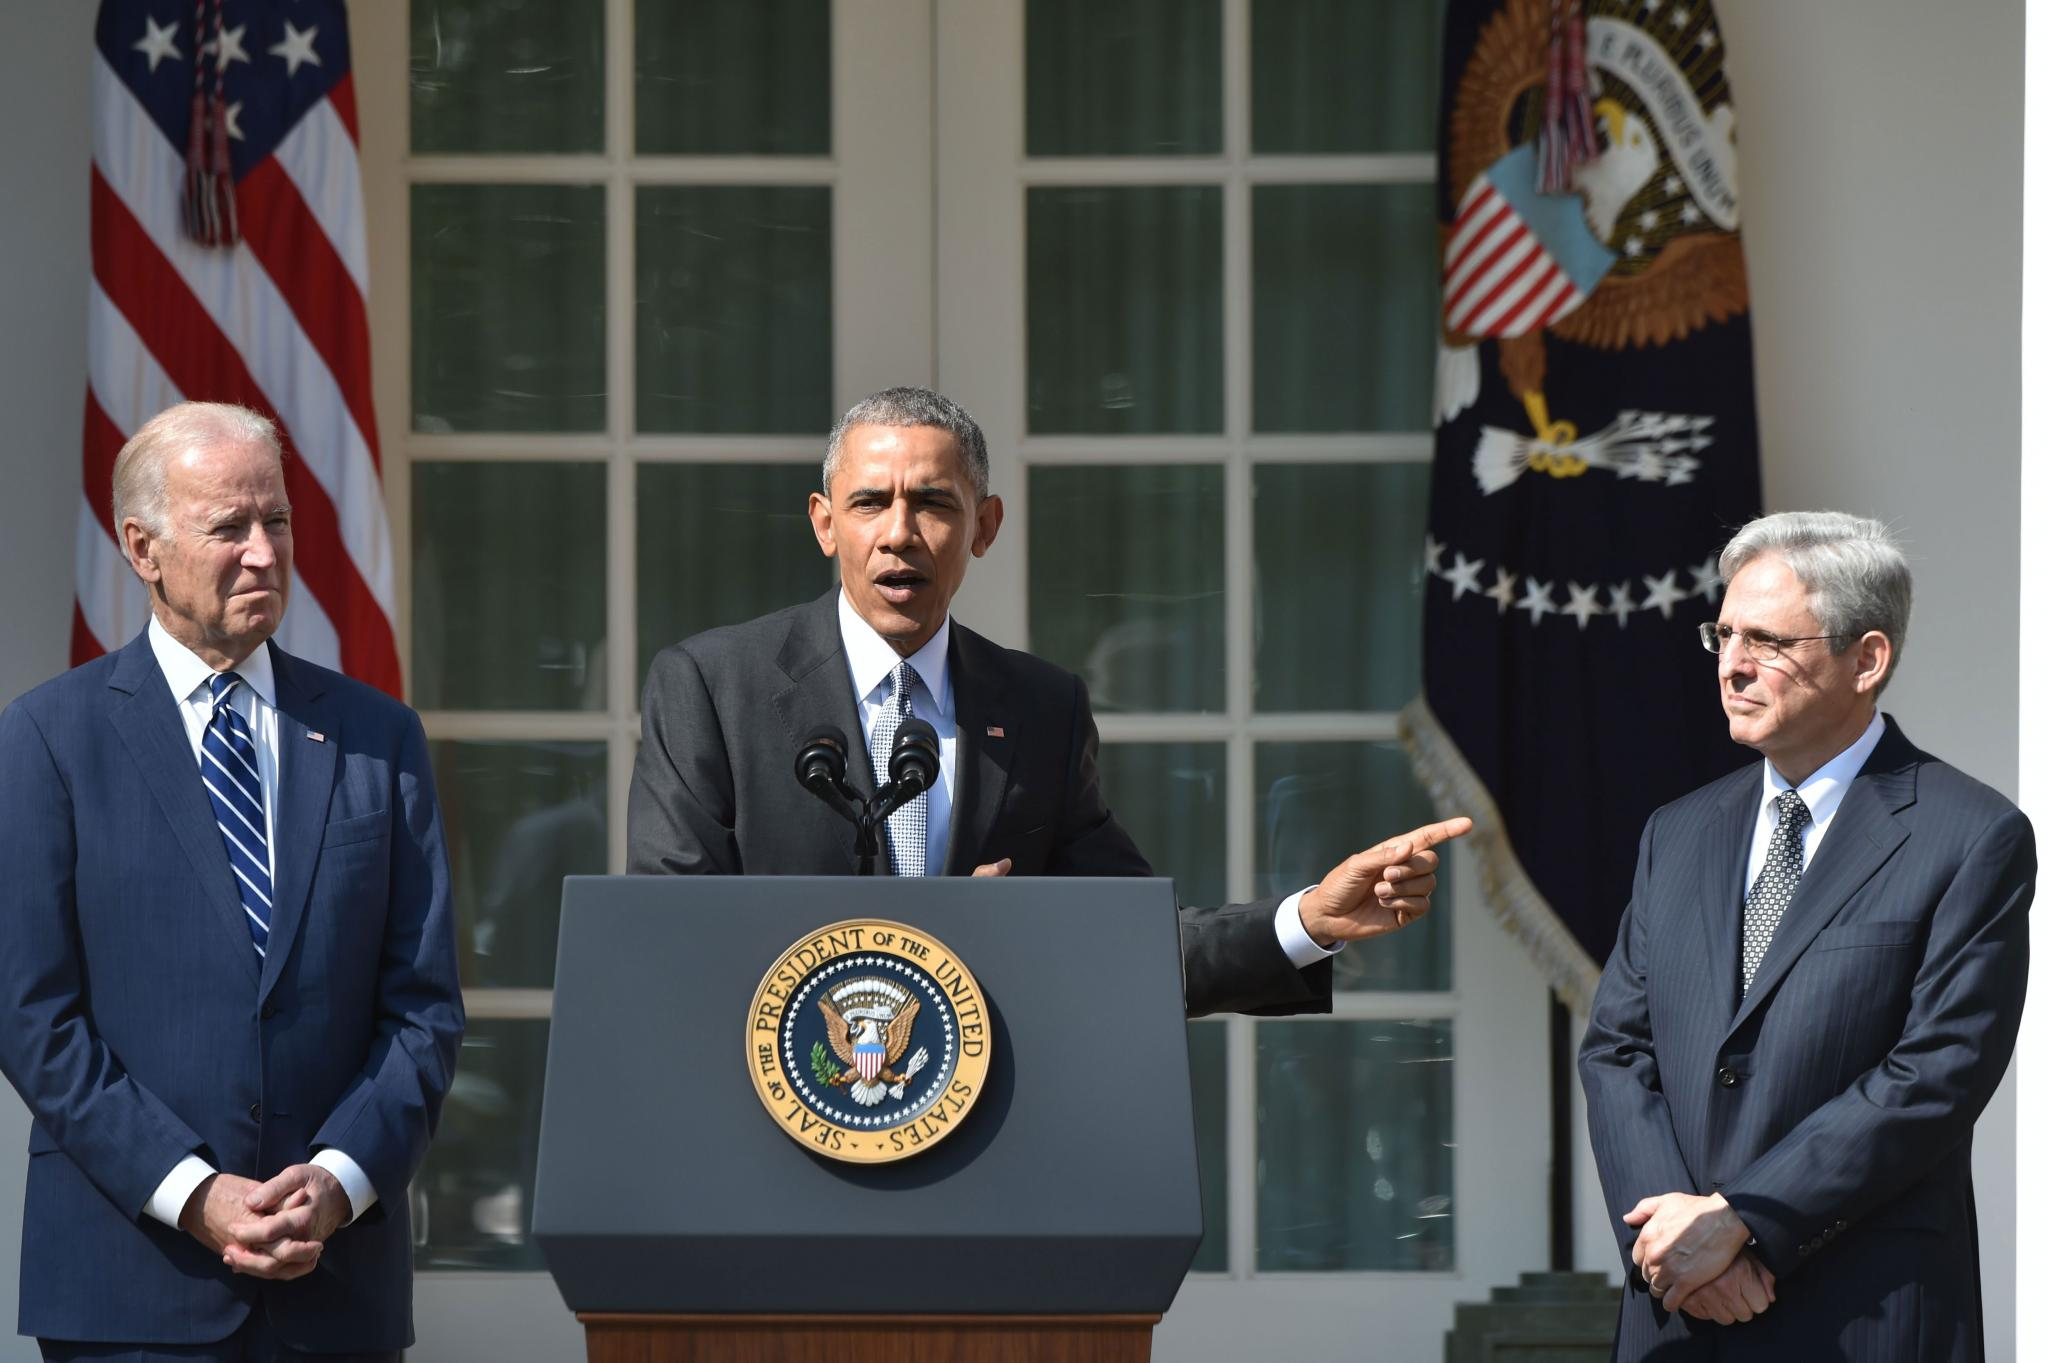 Merrick Garland, President Obama's Supreme Court Pick, is ...